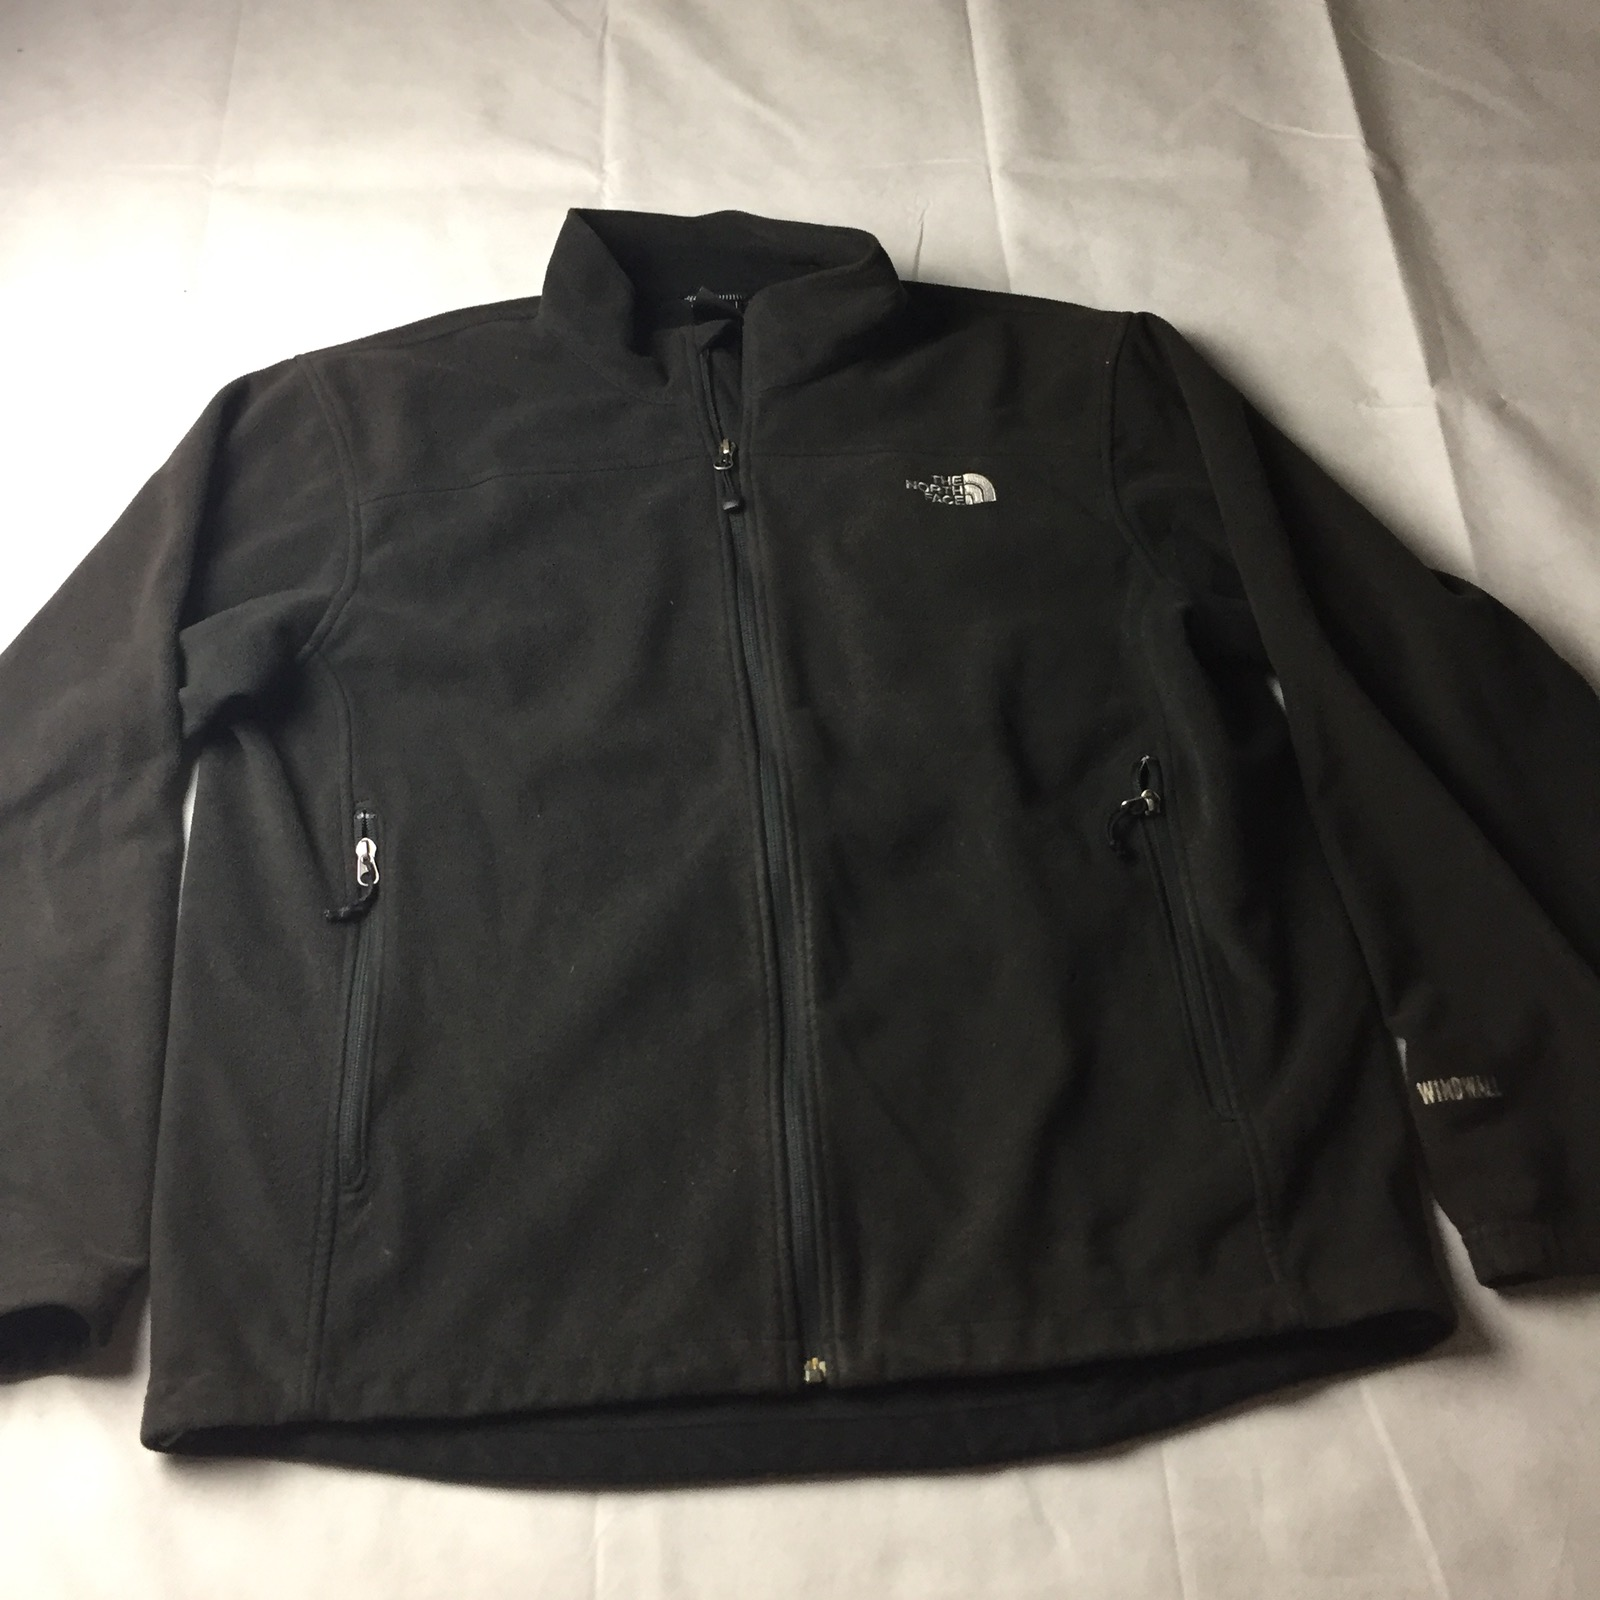 7ebb126af THE NORTH FACE Windwall Fleece Full Zip Jacket Men's Size XL